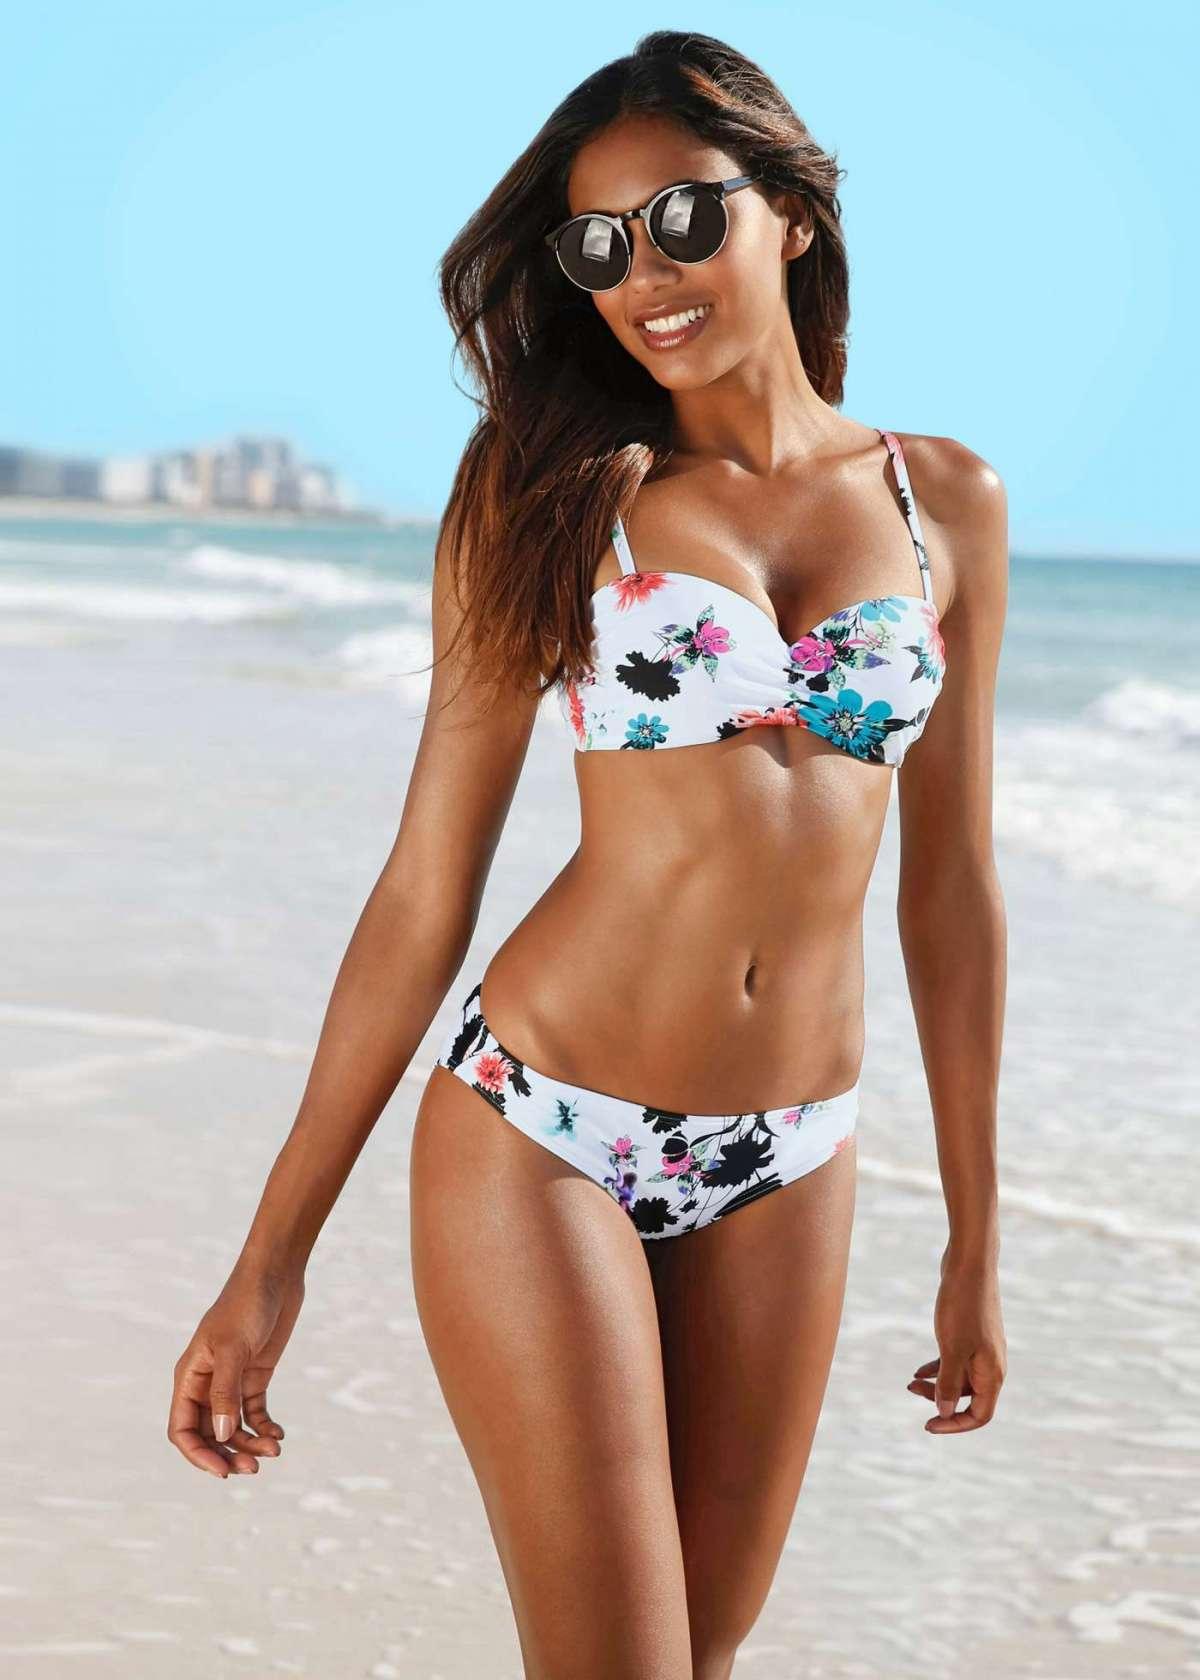 Bikini a fiori Bonprix a 23,99 euro